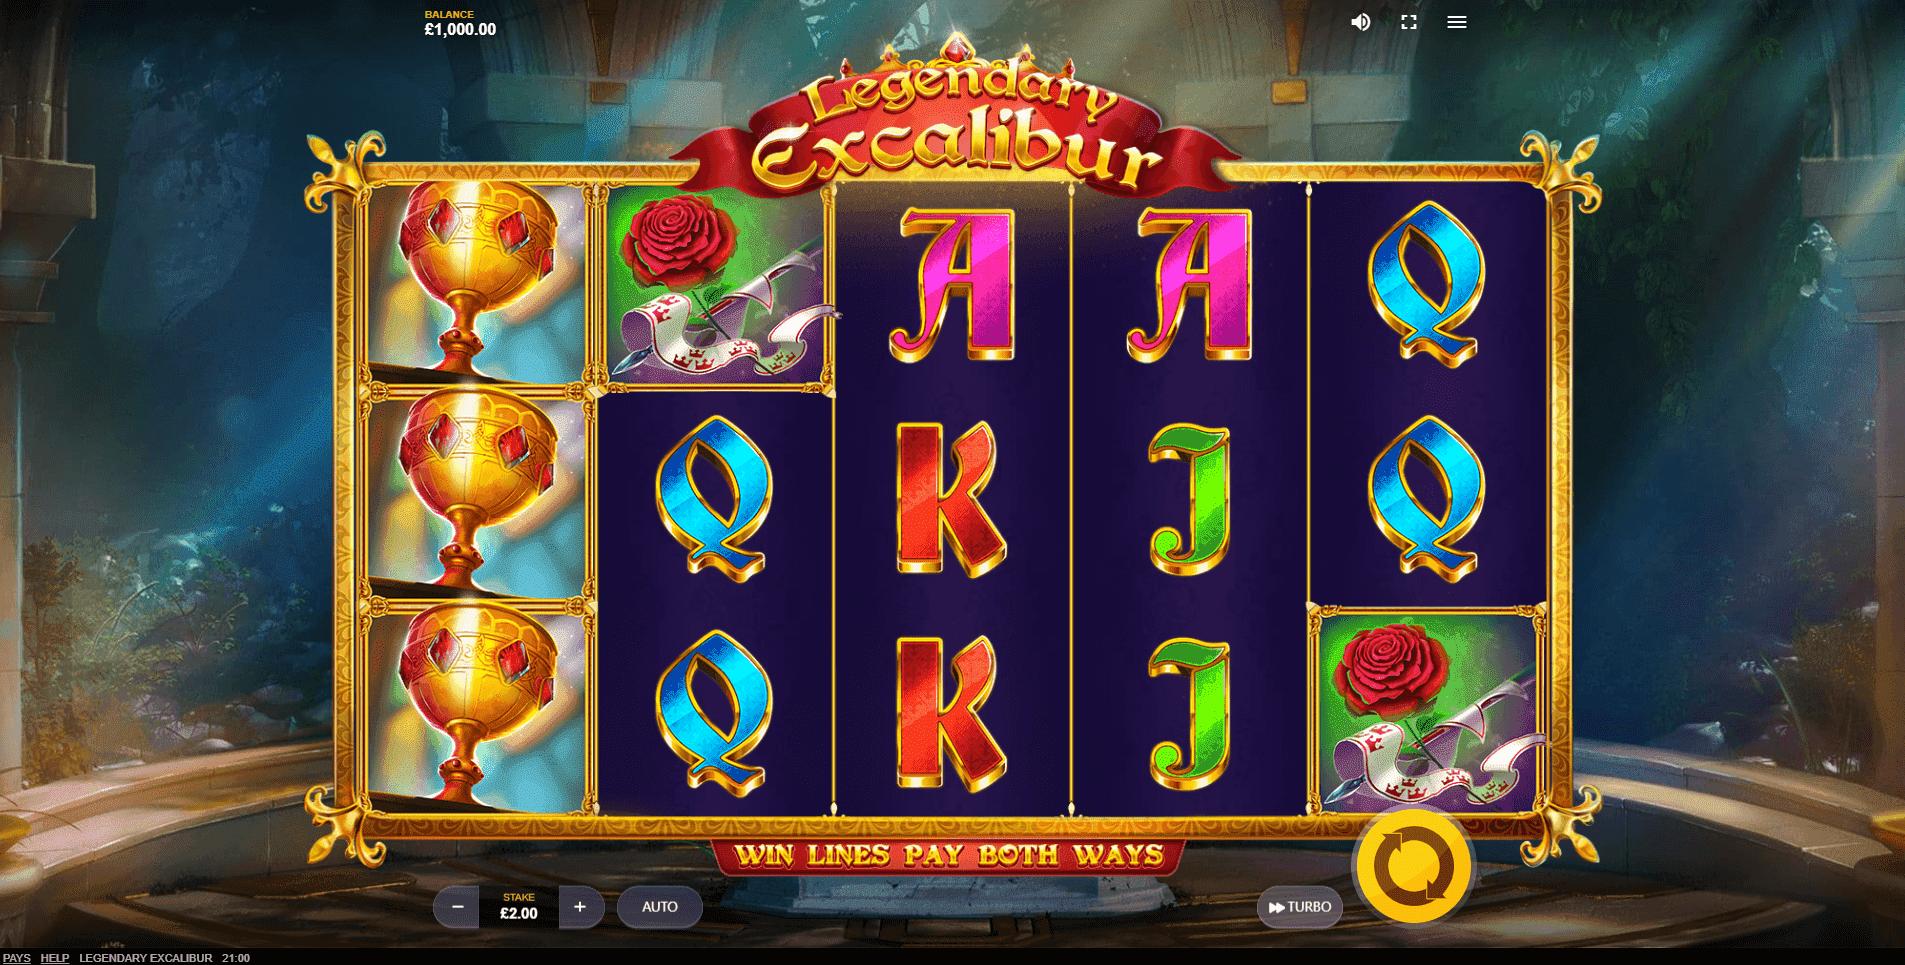 Legendary Excalibur slot machine screenshot